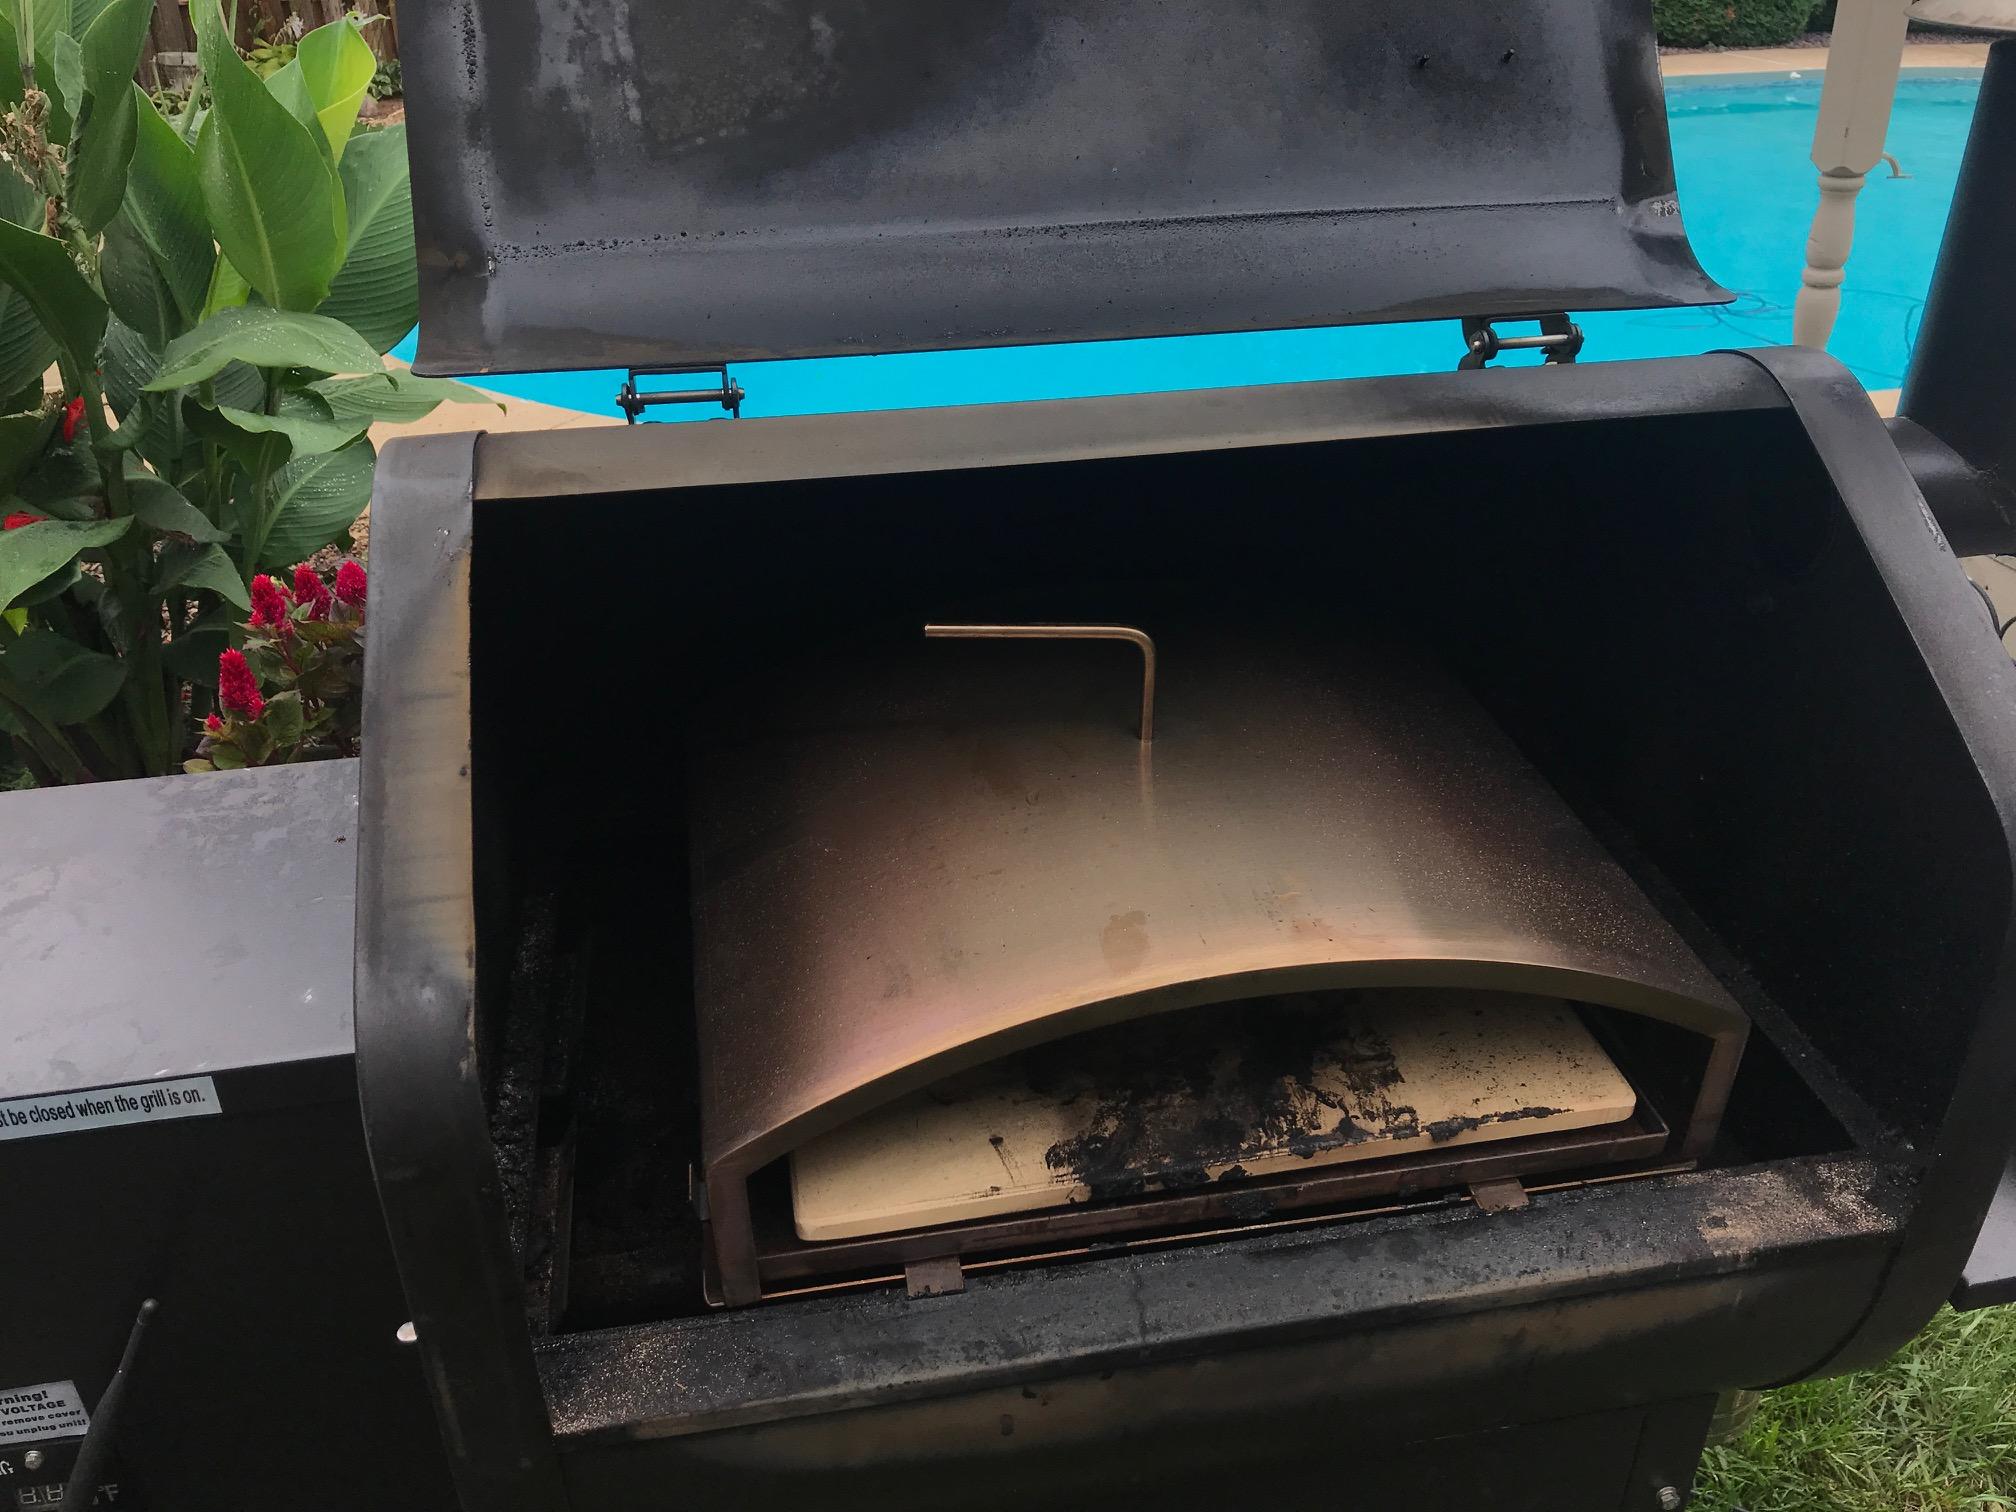 Heat Grill to 300*F